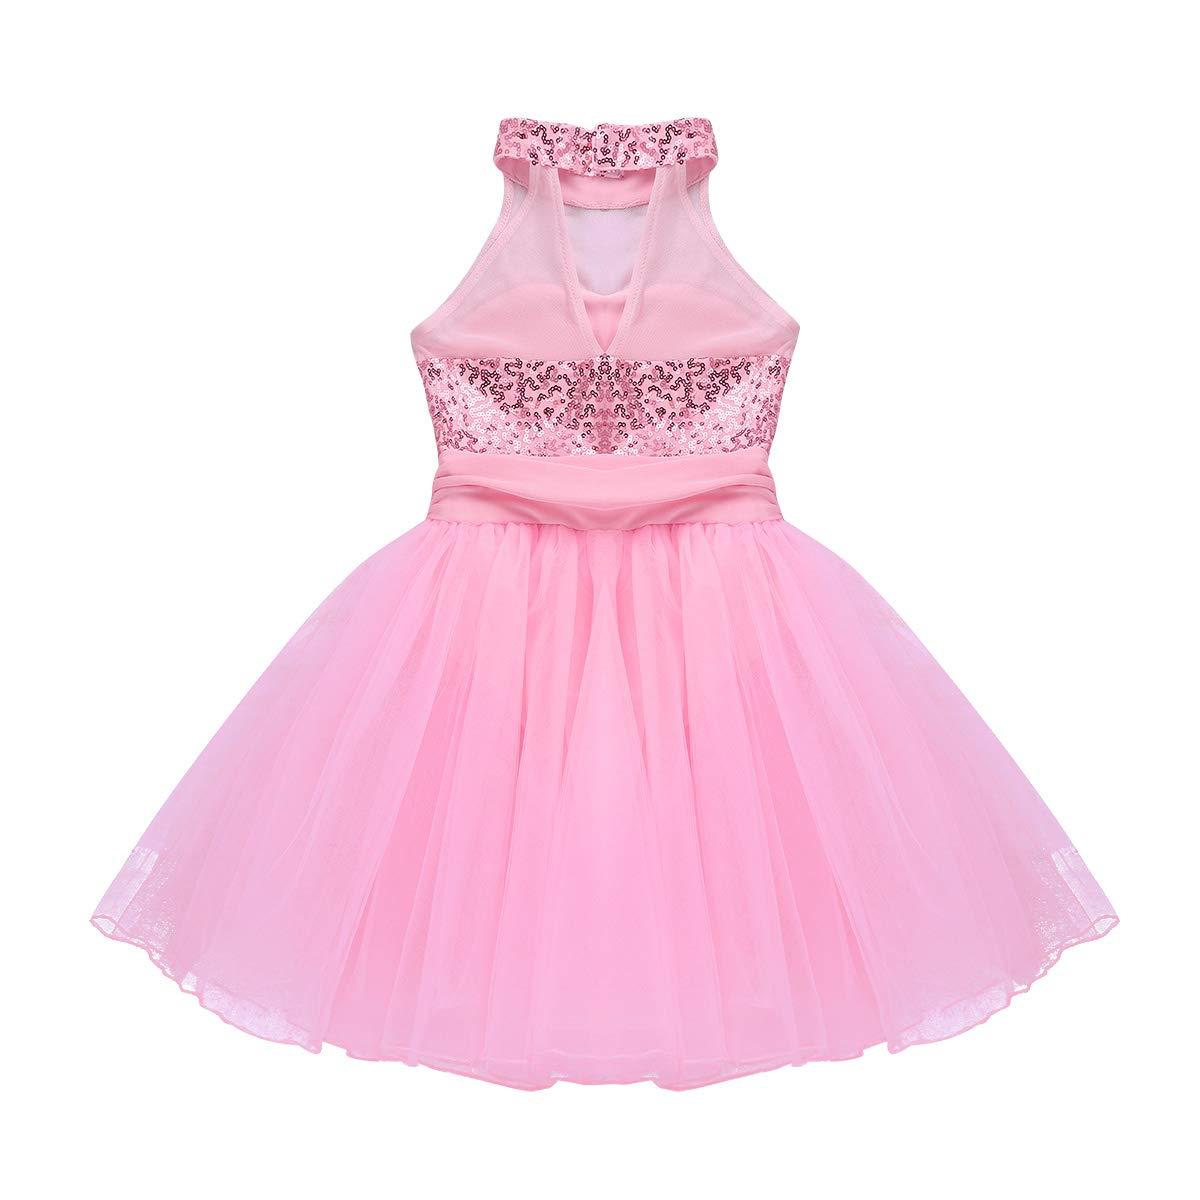 ACSUSS Girls Sequin Camisole Ballet Leotard Lyrical Latin Jazz Modern Dance Dress Crop Top with High Low Dress Dancewear